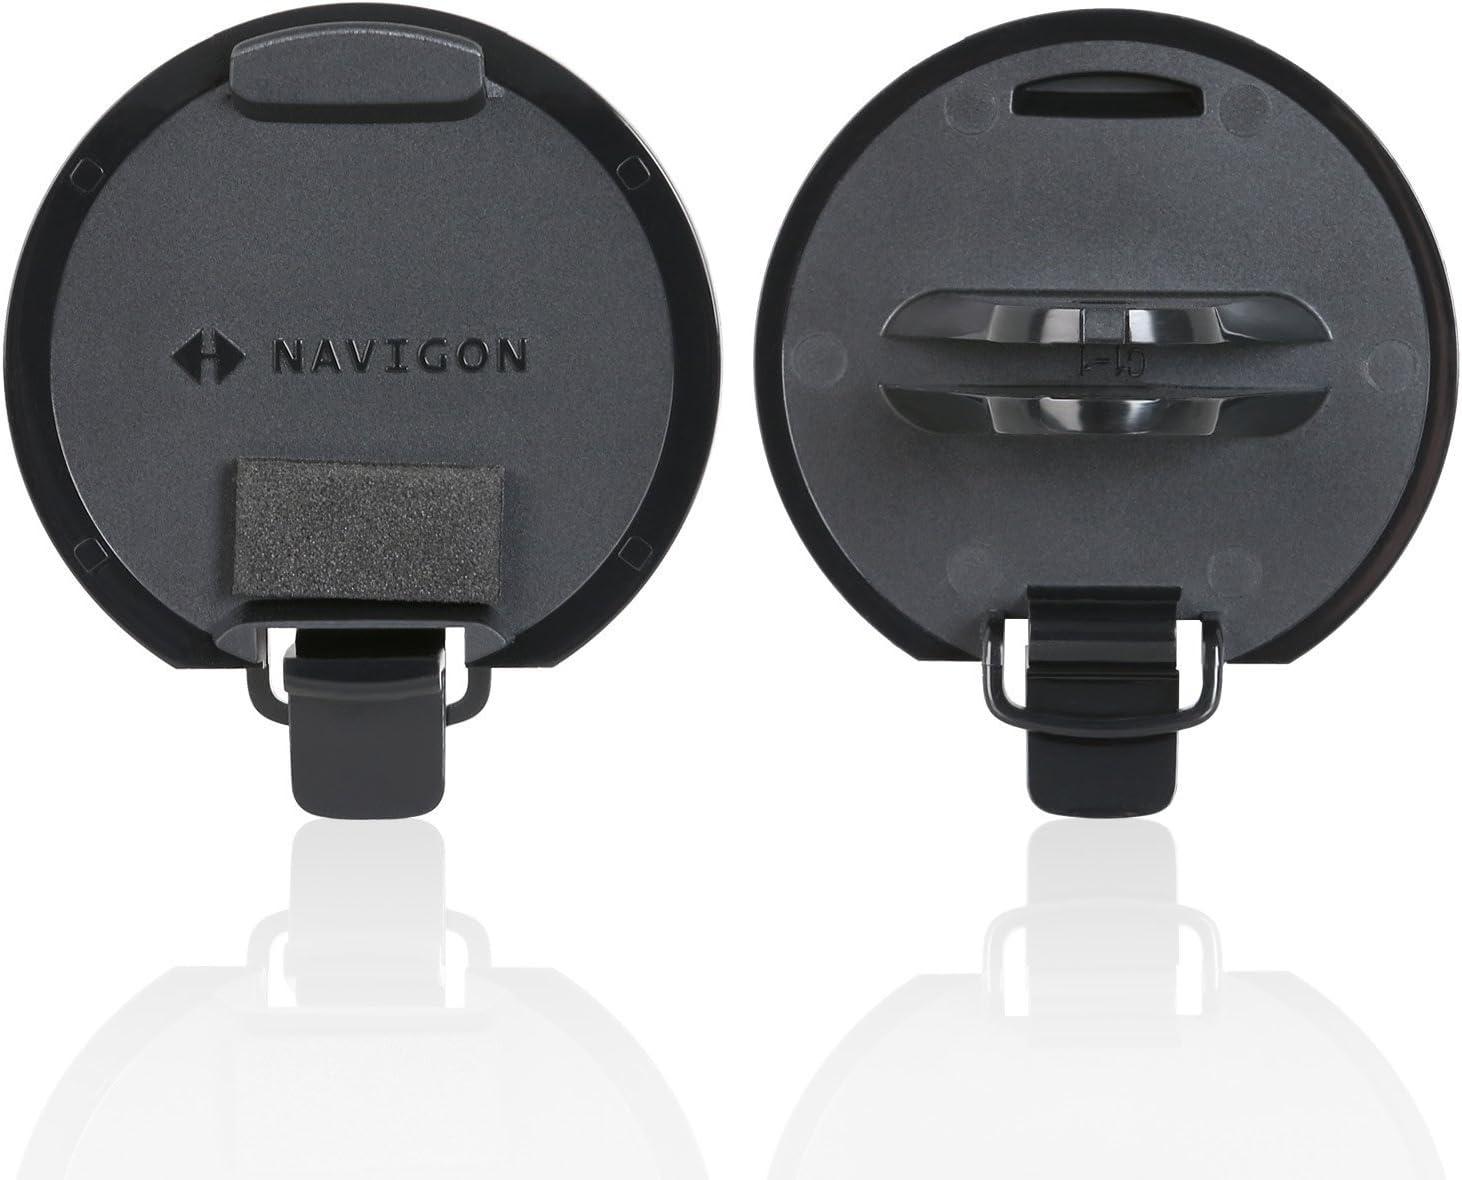 Plus 42 40 navigon update easy Conception Plus: